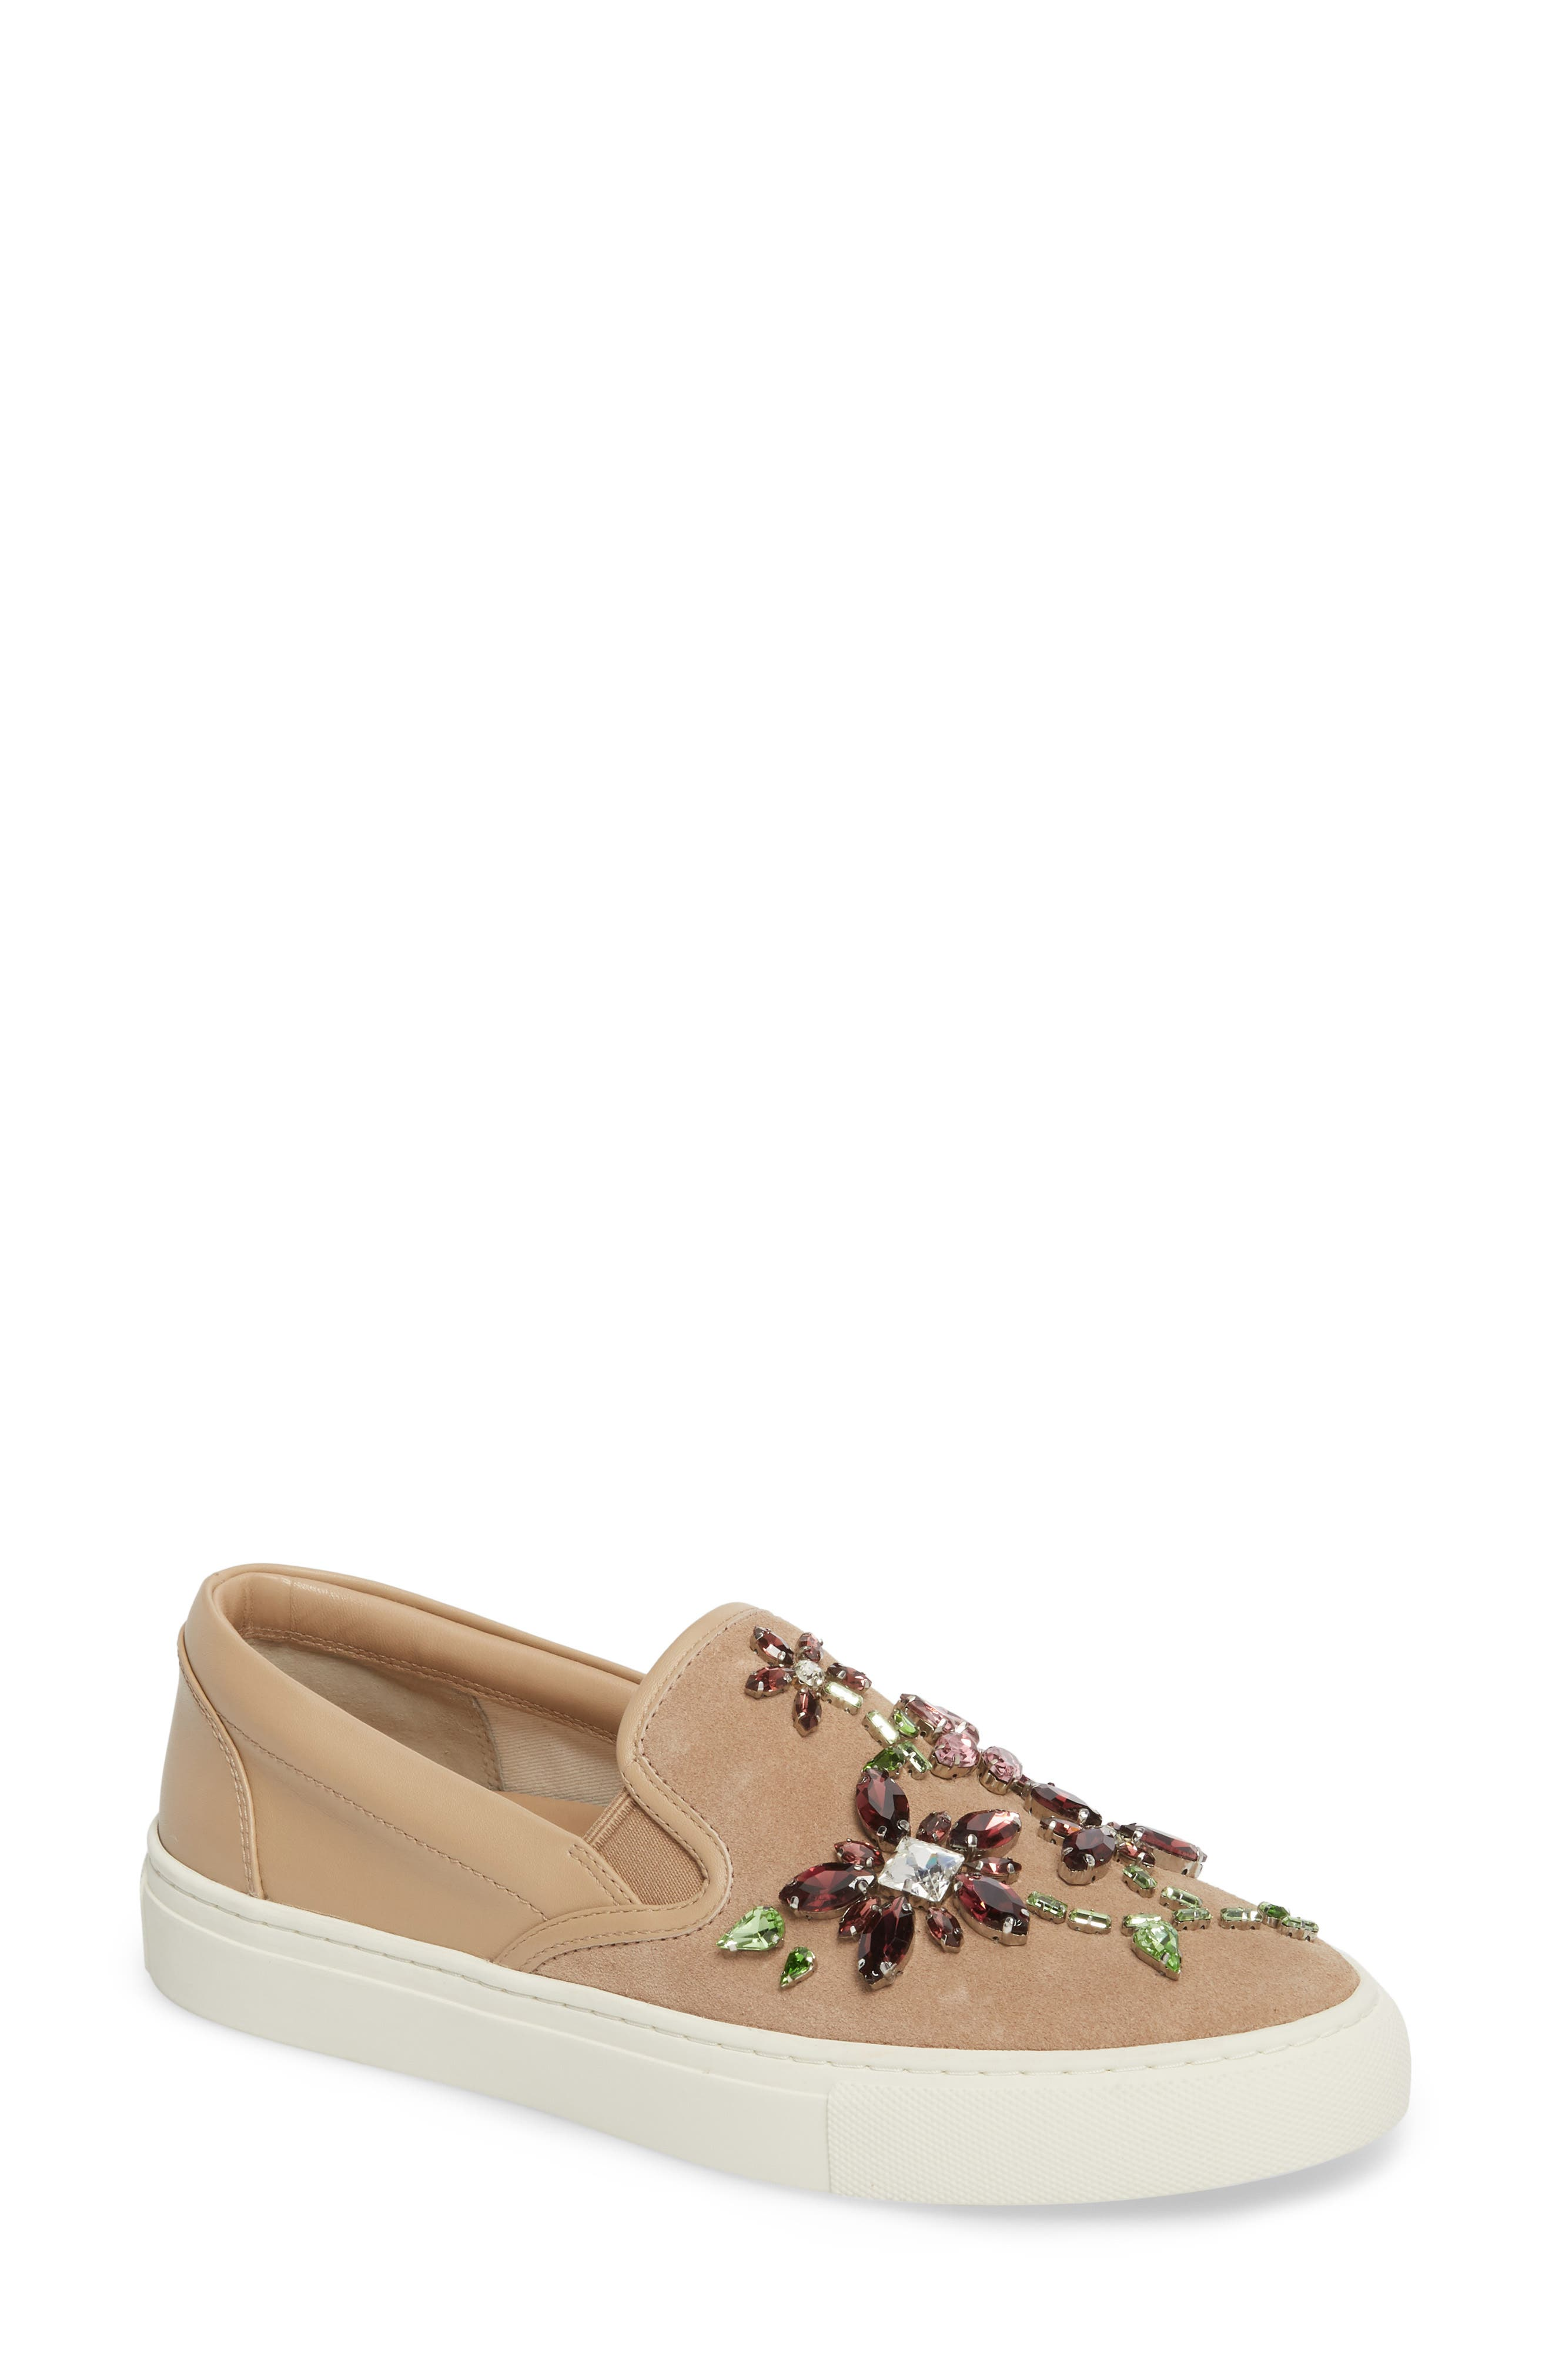 Meadow Embellished Slip-On Sneaker,                         Main,                         color, 254